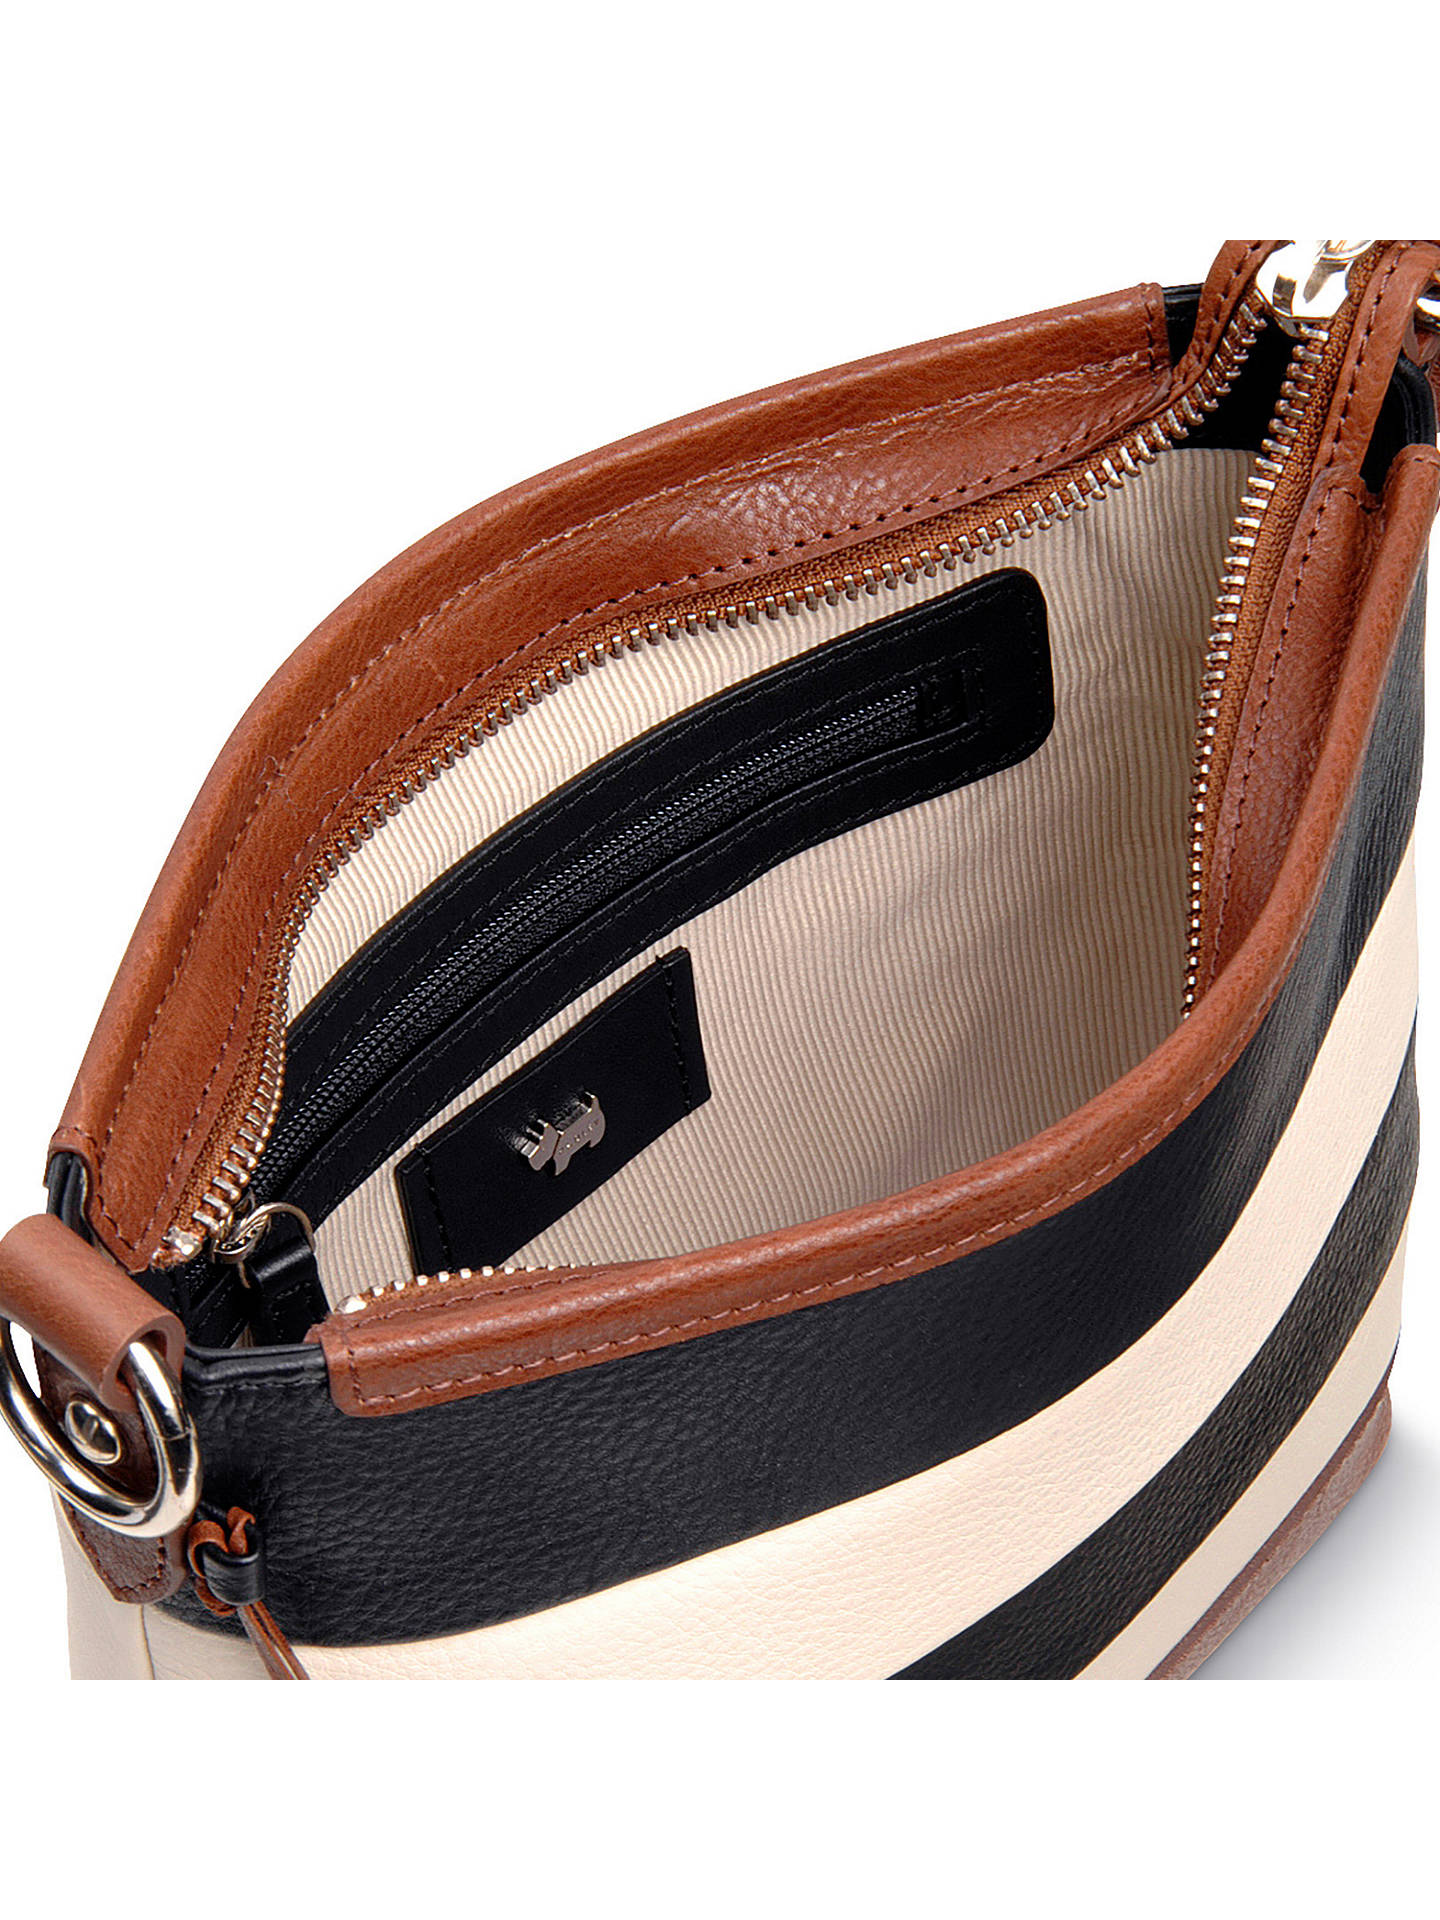 4fce3b9e8c4 BuyRadley Babington Medium Stripe Leather Cross Body Bag, Black Cream  Online at johnlewis.